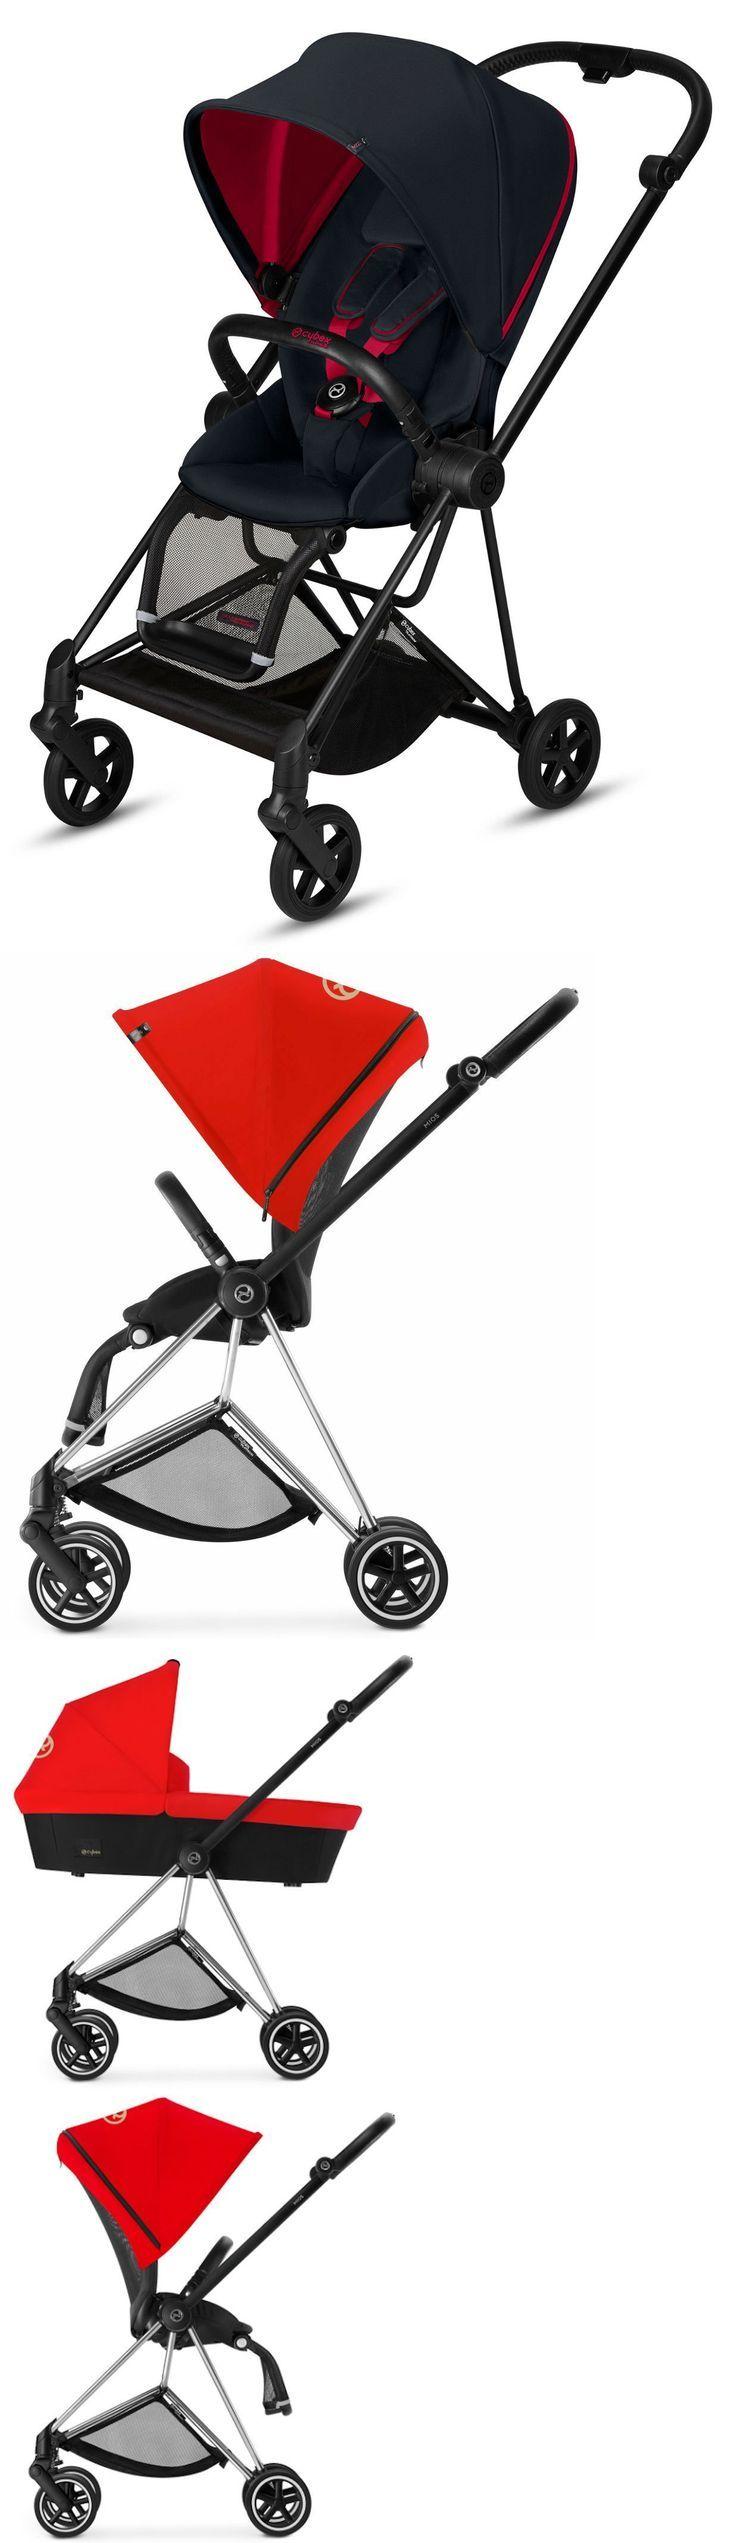 Other Strollers 2989 Cybex Mios Ferrari Lightweig